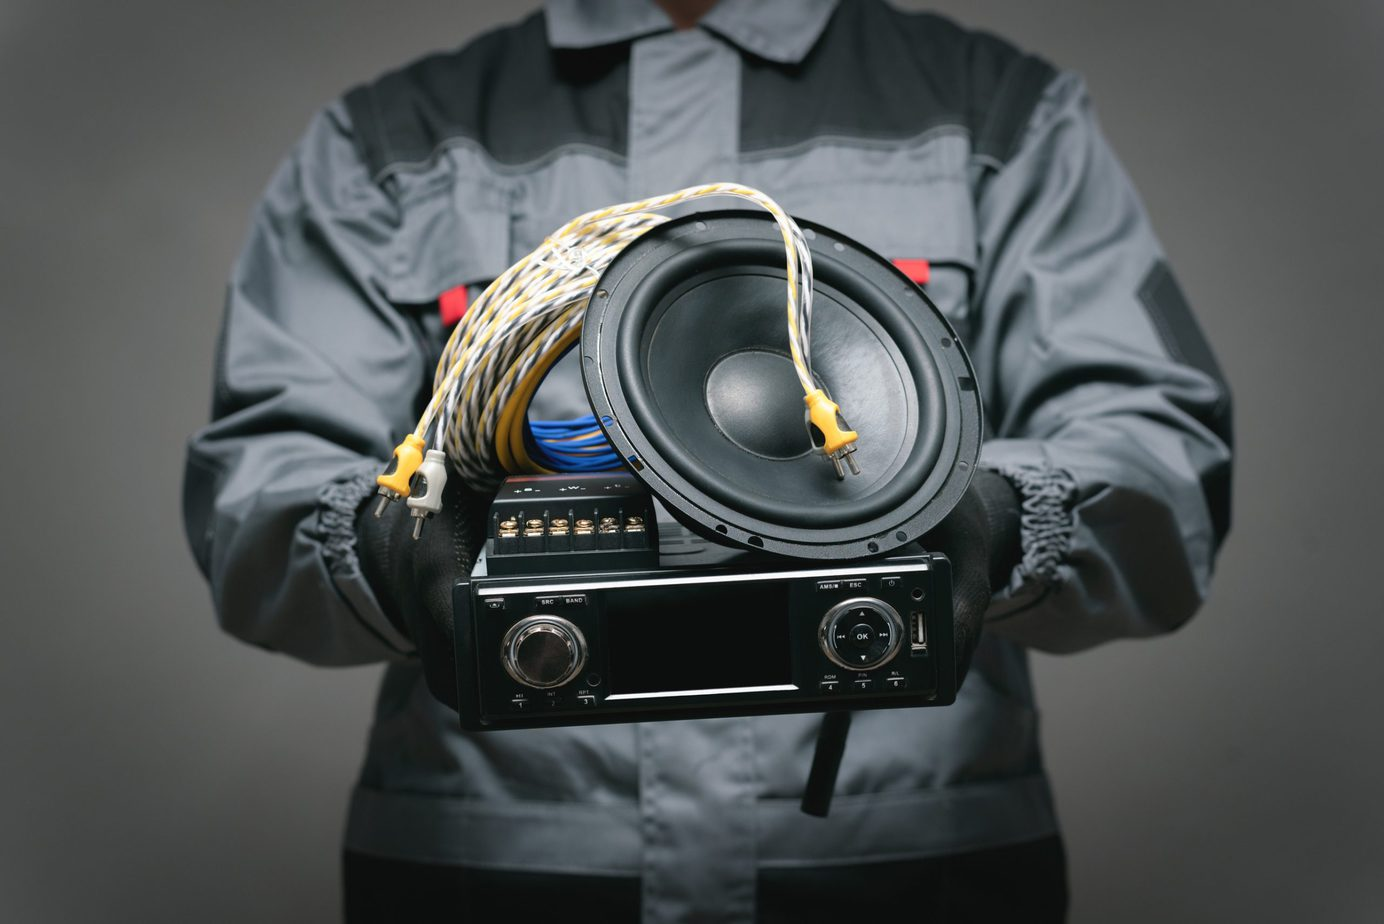 man holding subwoofer car stereo